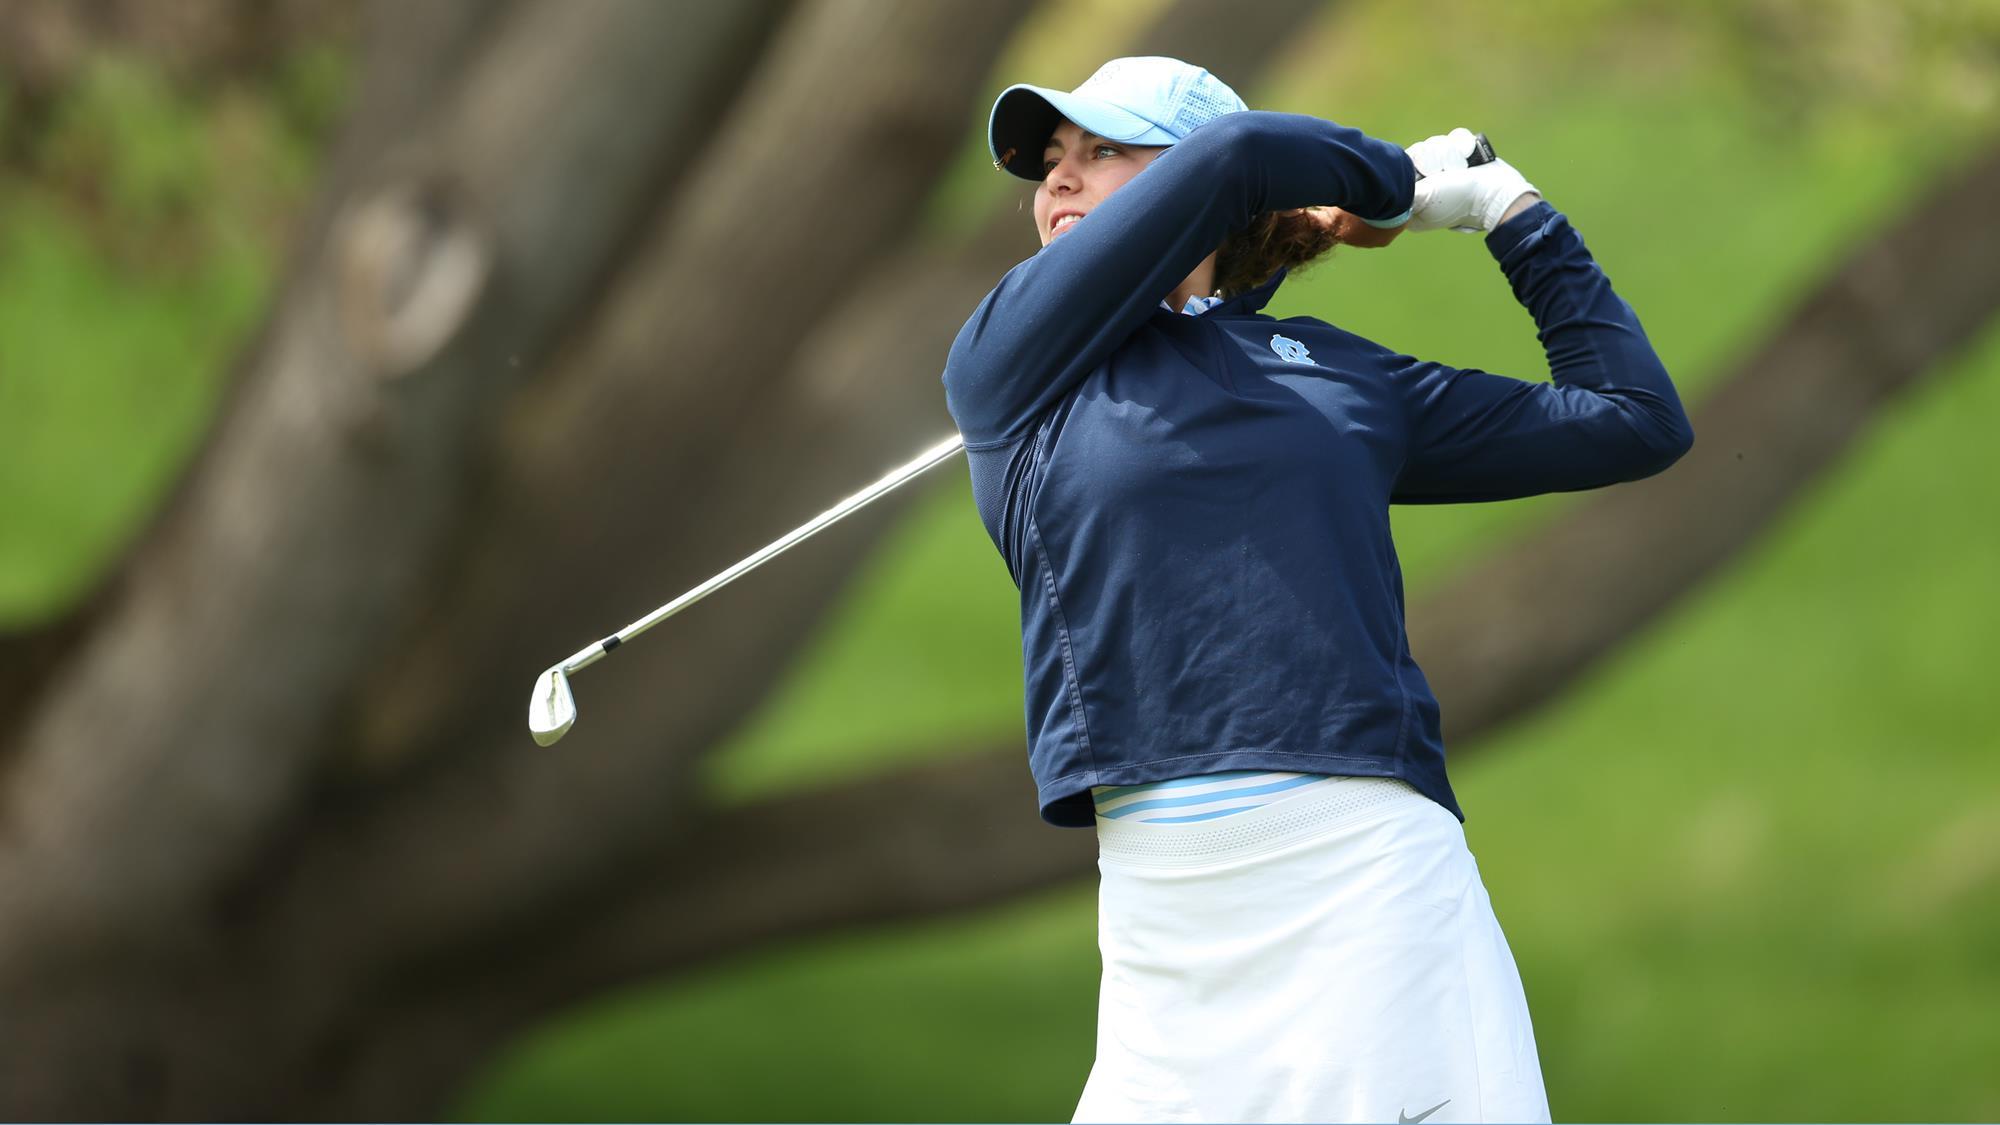 Former Radnor High Golfer Competes in ShopRite LPGA Classic